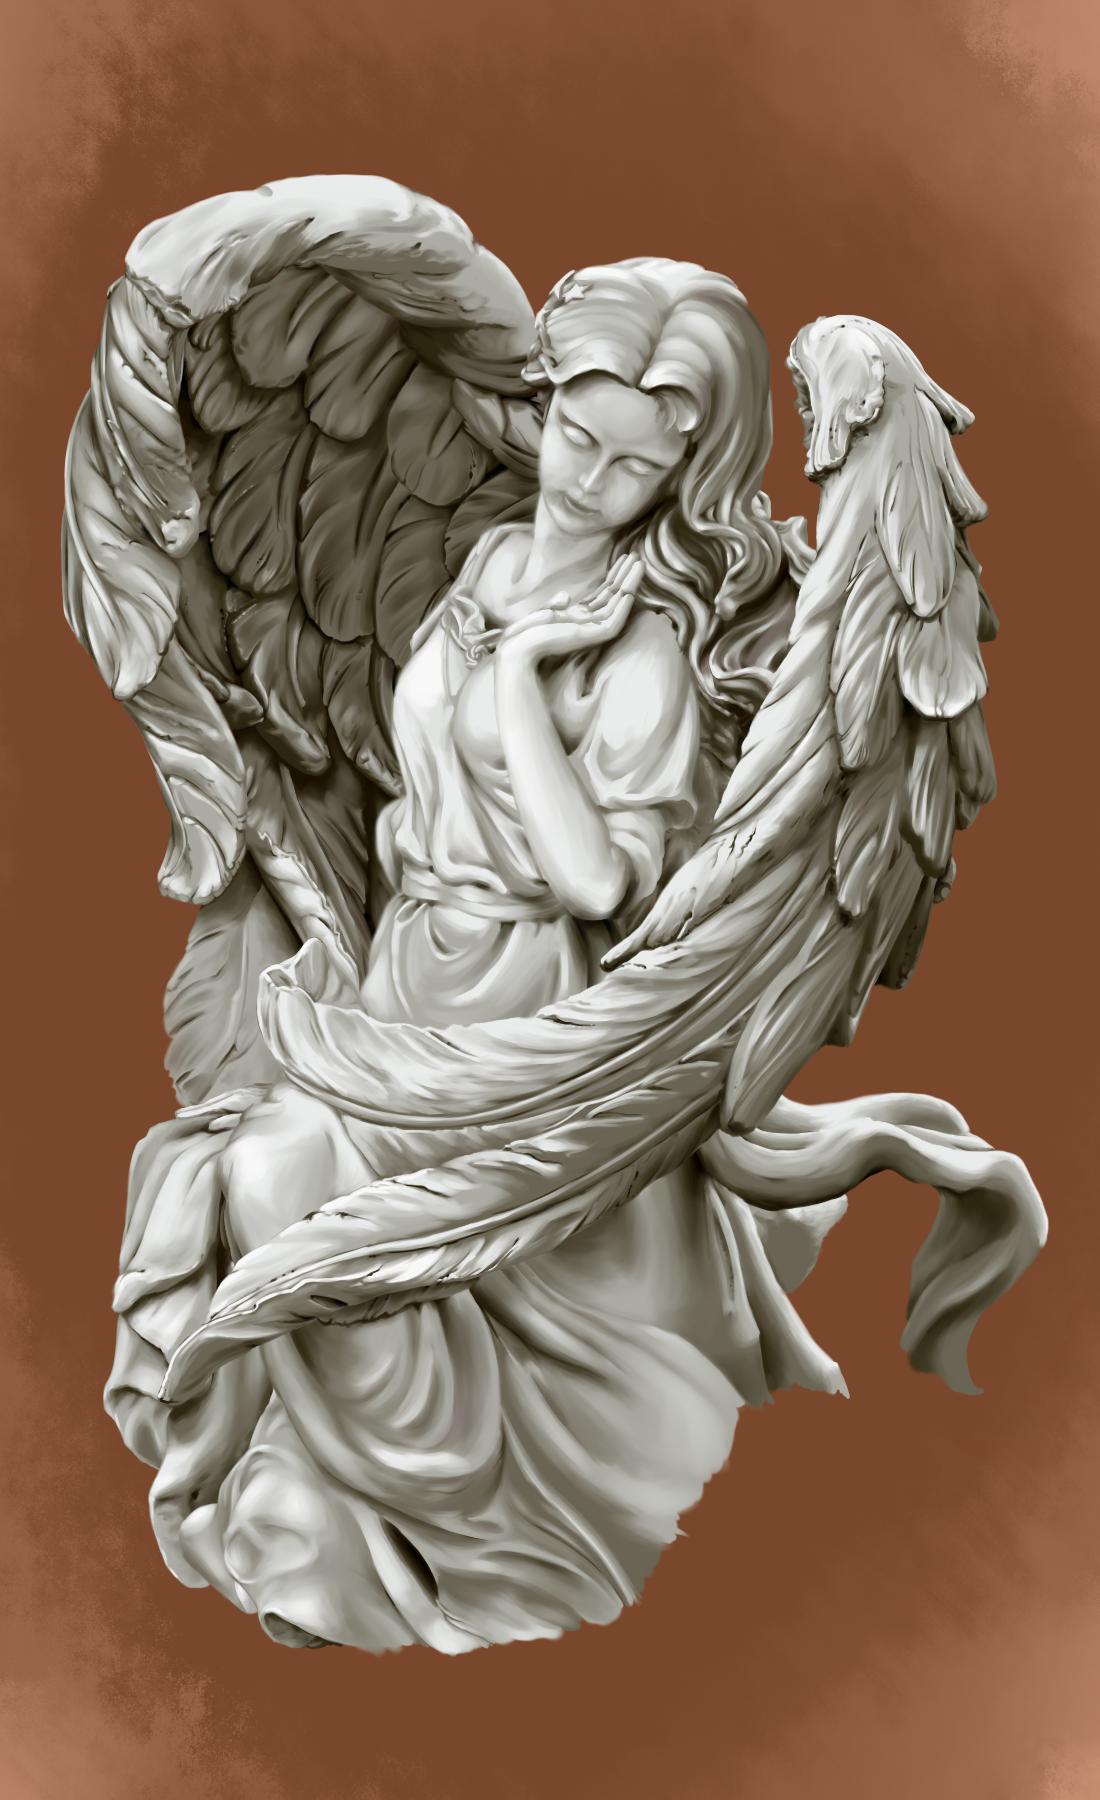 study angel statue by glv da on deviantart